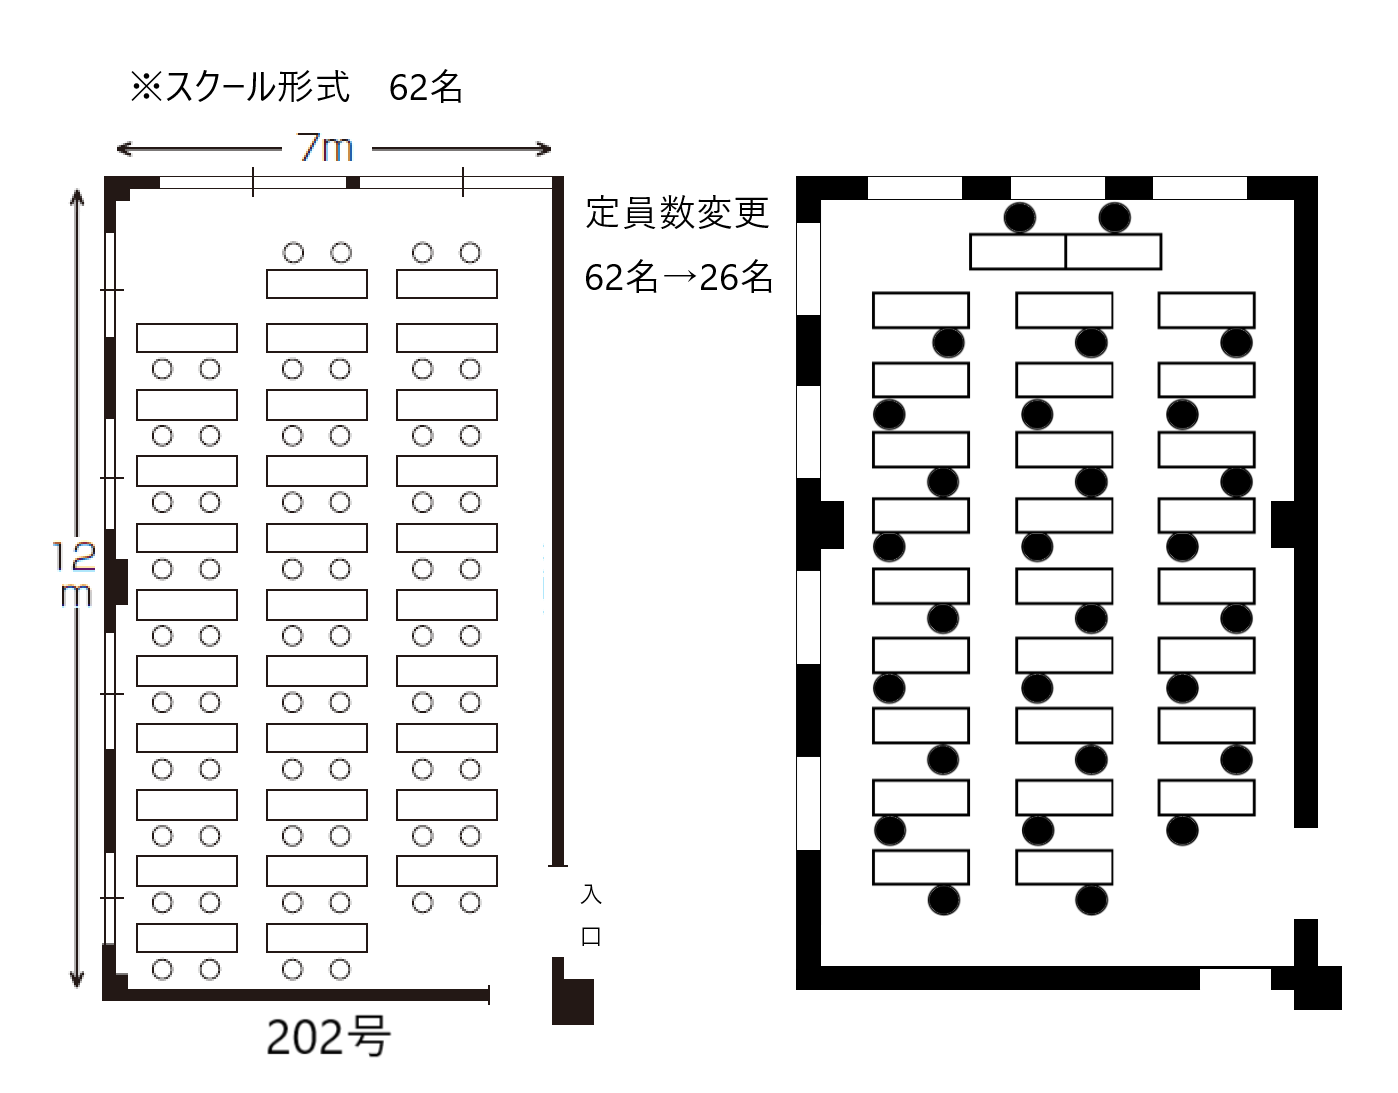 202→202